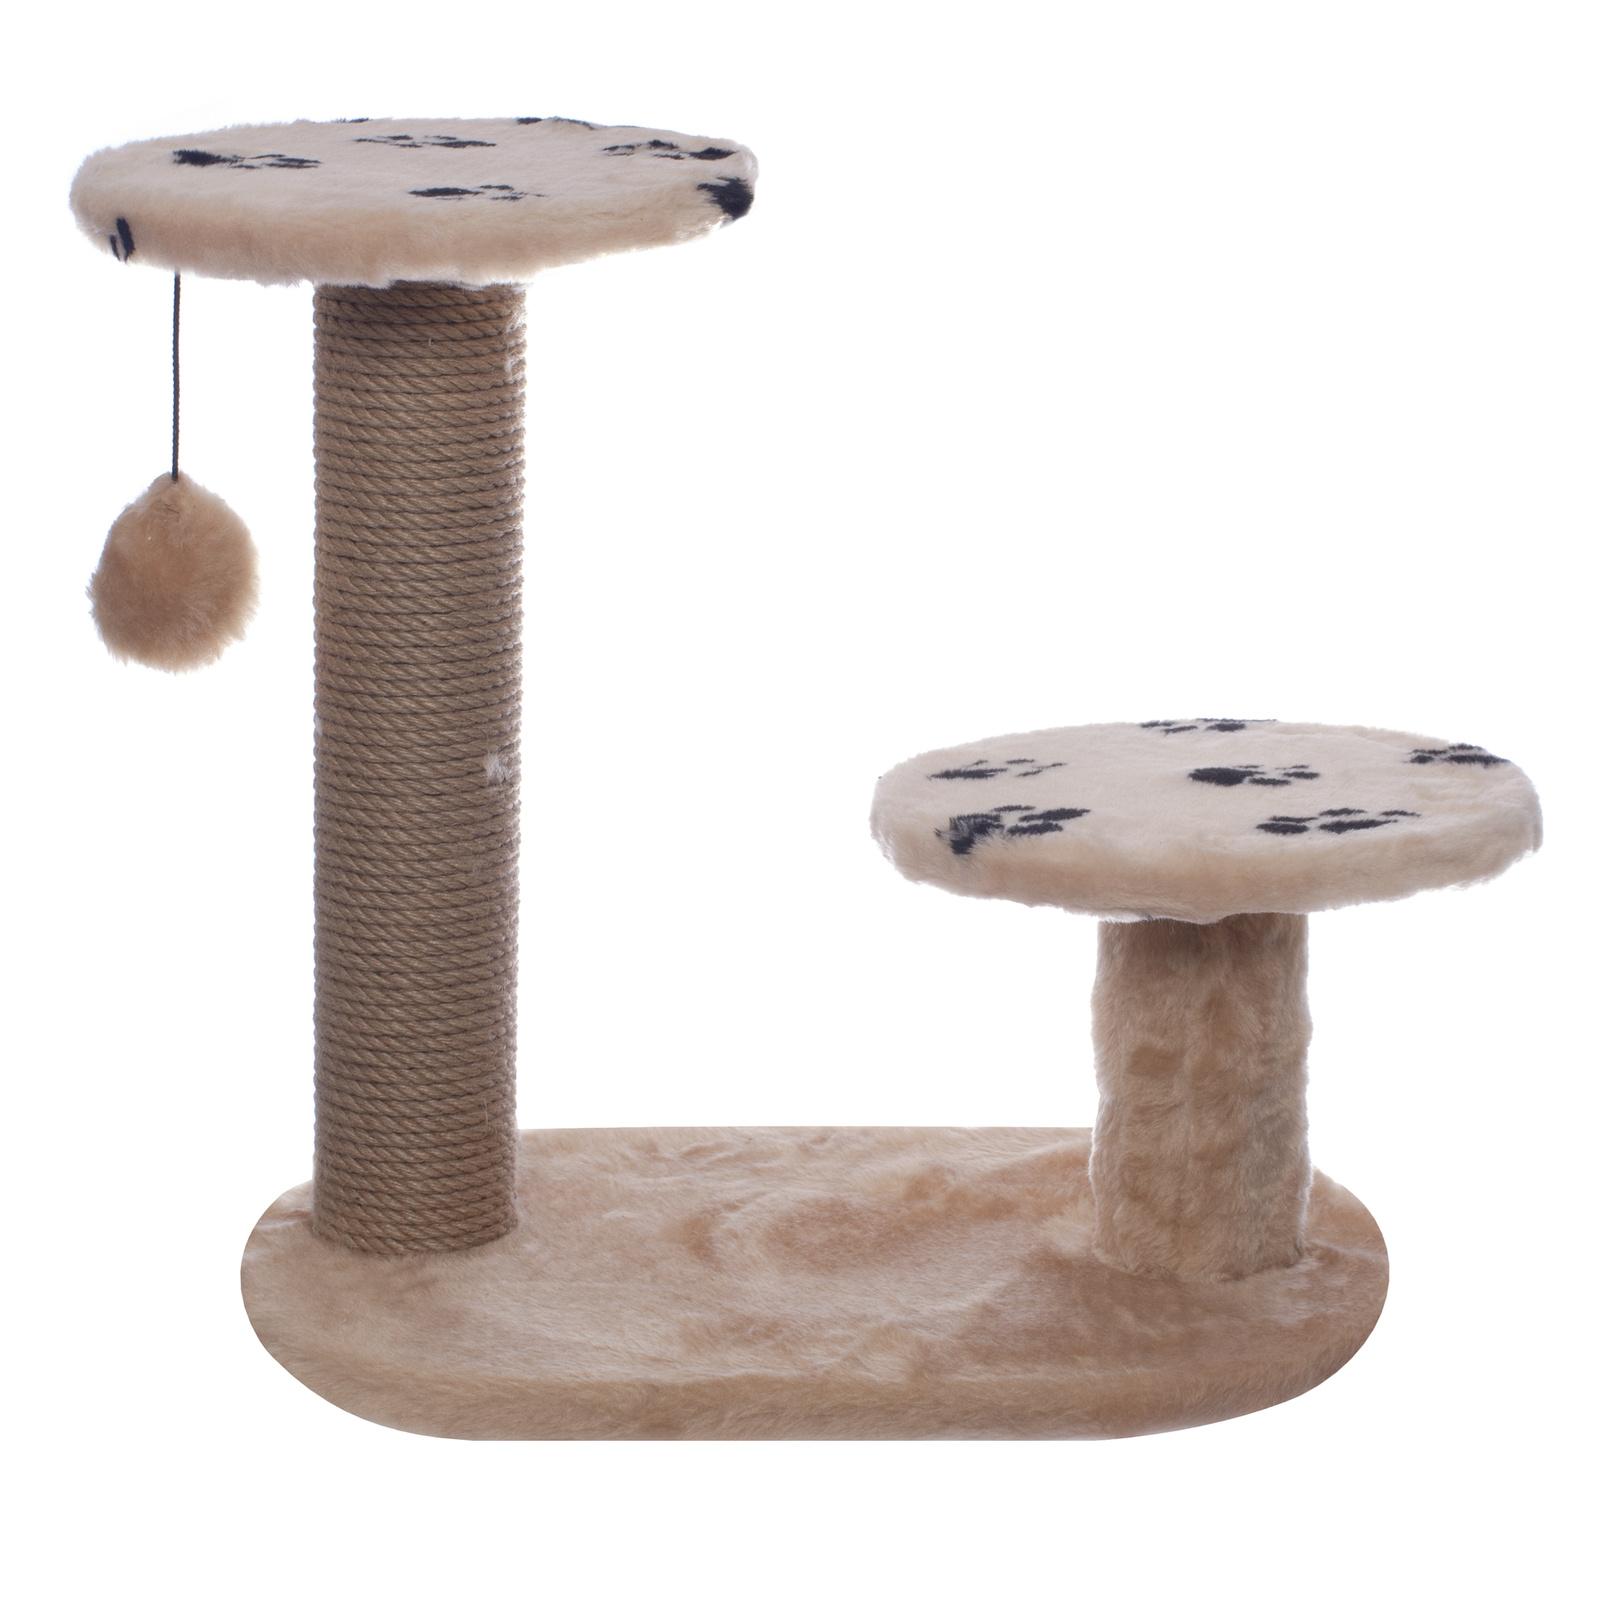 Yami-Yami Когтеточка Джут 95 , бежевая круглая, 56*36*52 см (5,25 кг) когтеточка дарэлл джут 95 круглая с 2 полками серая 56 х 36 х 52 см 1 шт